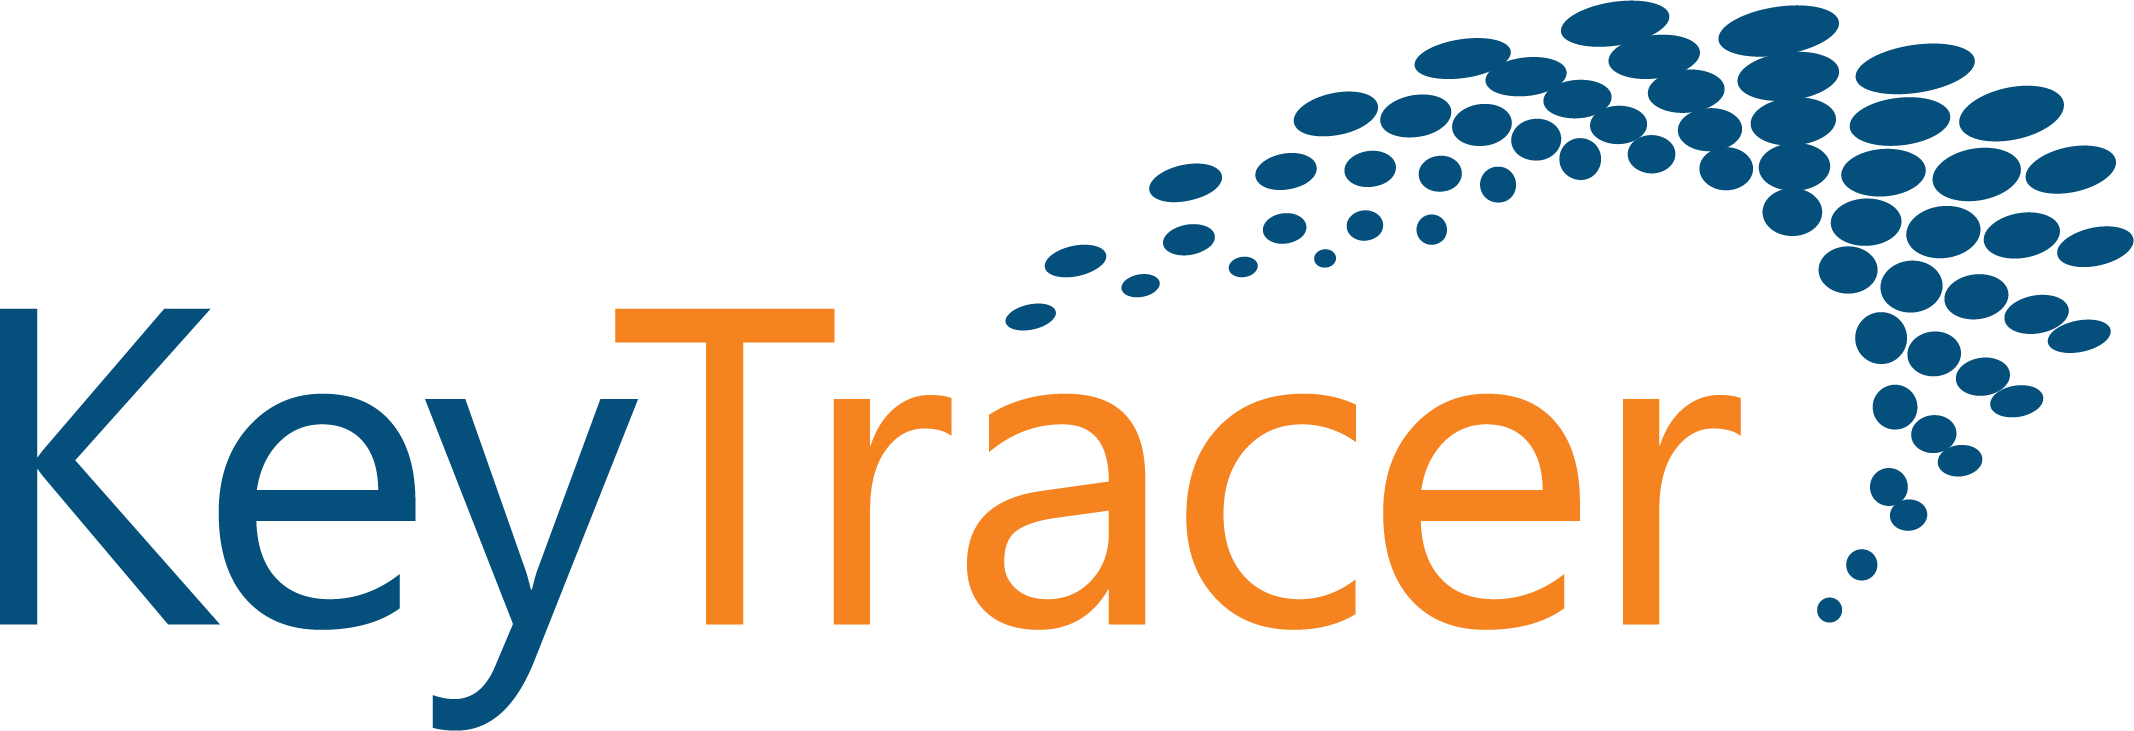 KeyTracer_logo